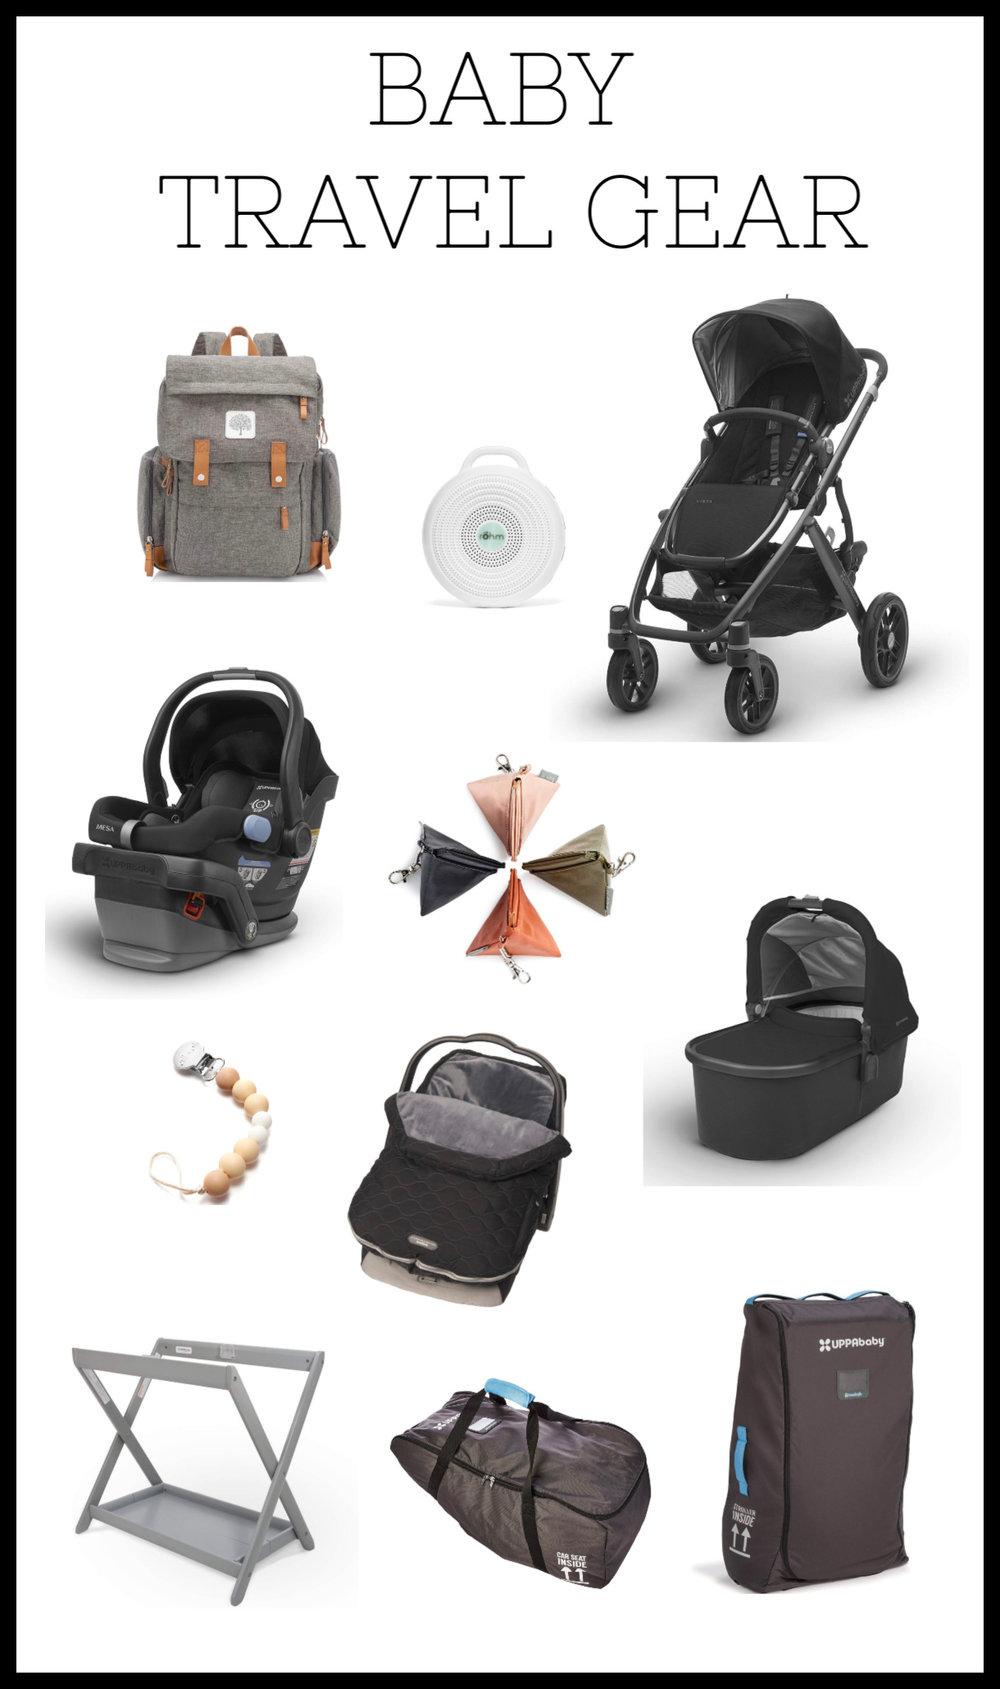 Baby Travel Gear (1).jpg